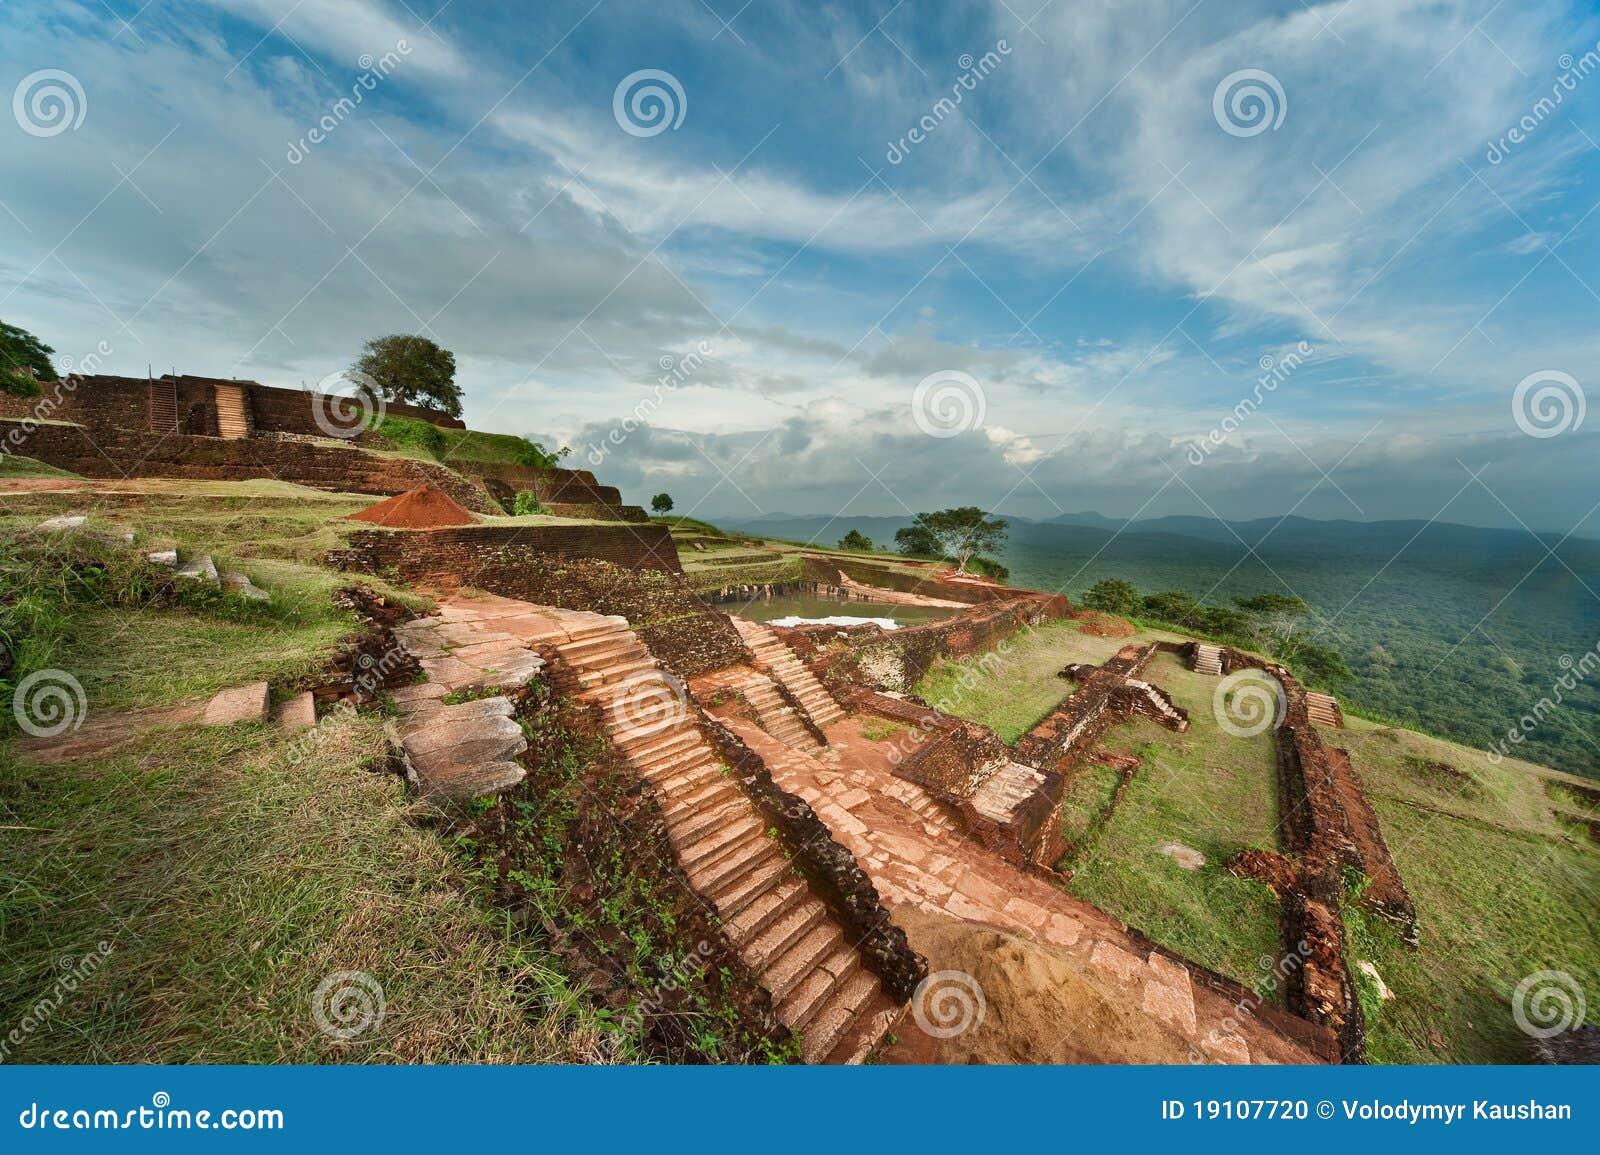 Sigiriya Rock Fortress, Sri Lanka